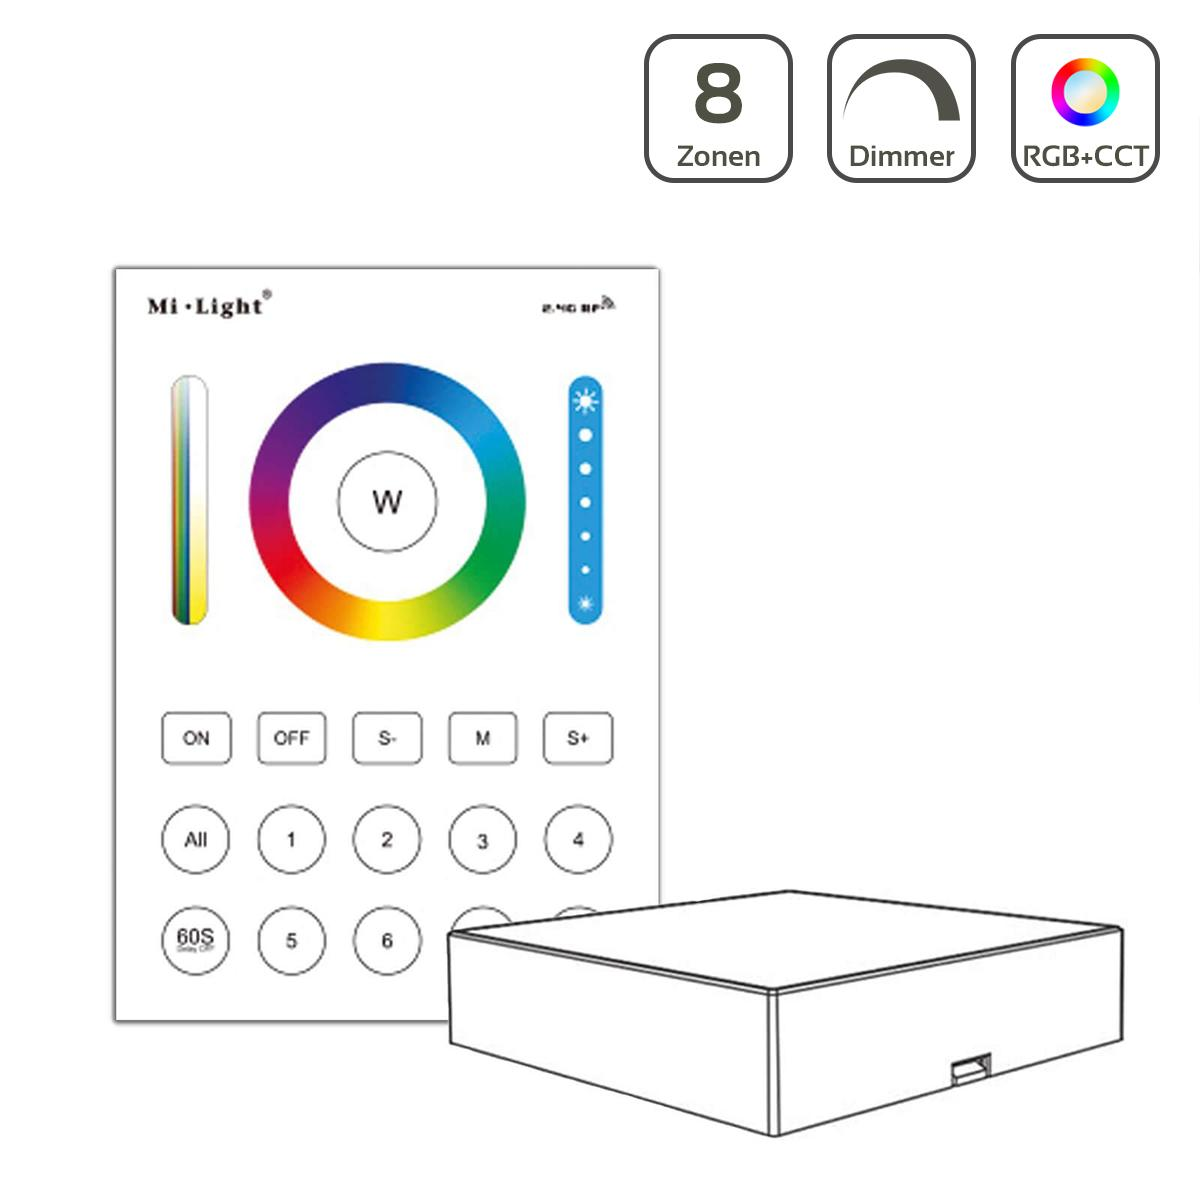 MiBoxer RGB+CCT Wandschalter 8 Zonen Aufbau Dimmen Schalten Farbsteuerung batteriebetrieben B8